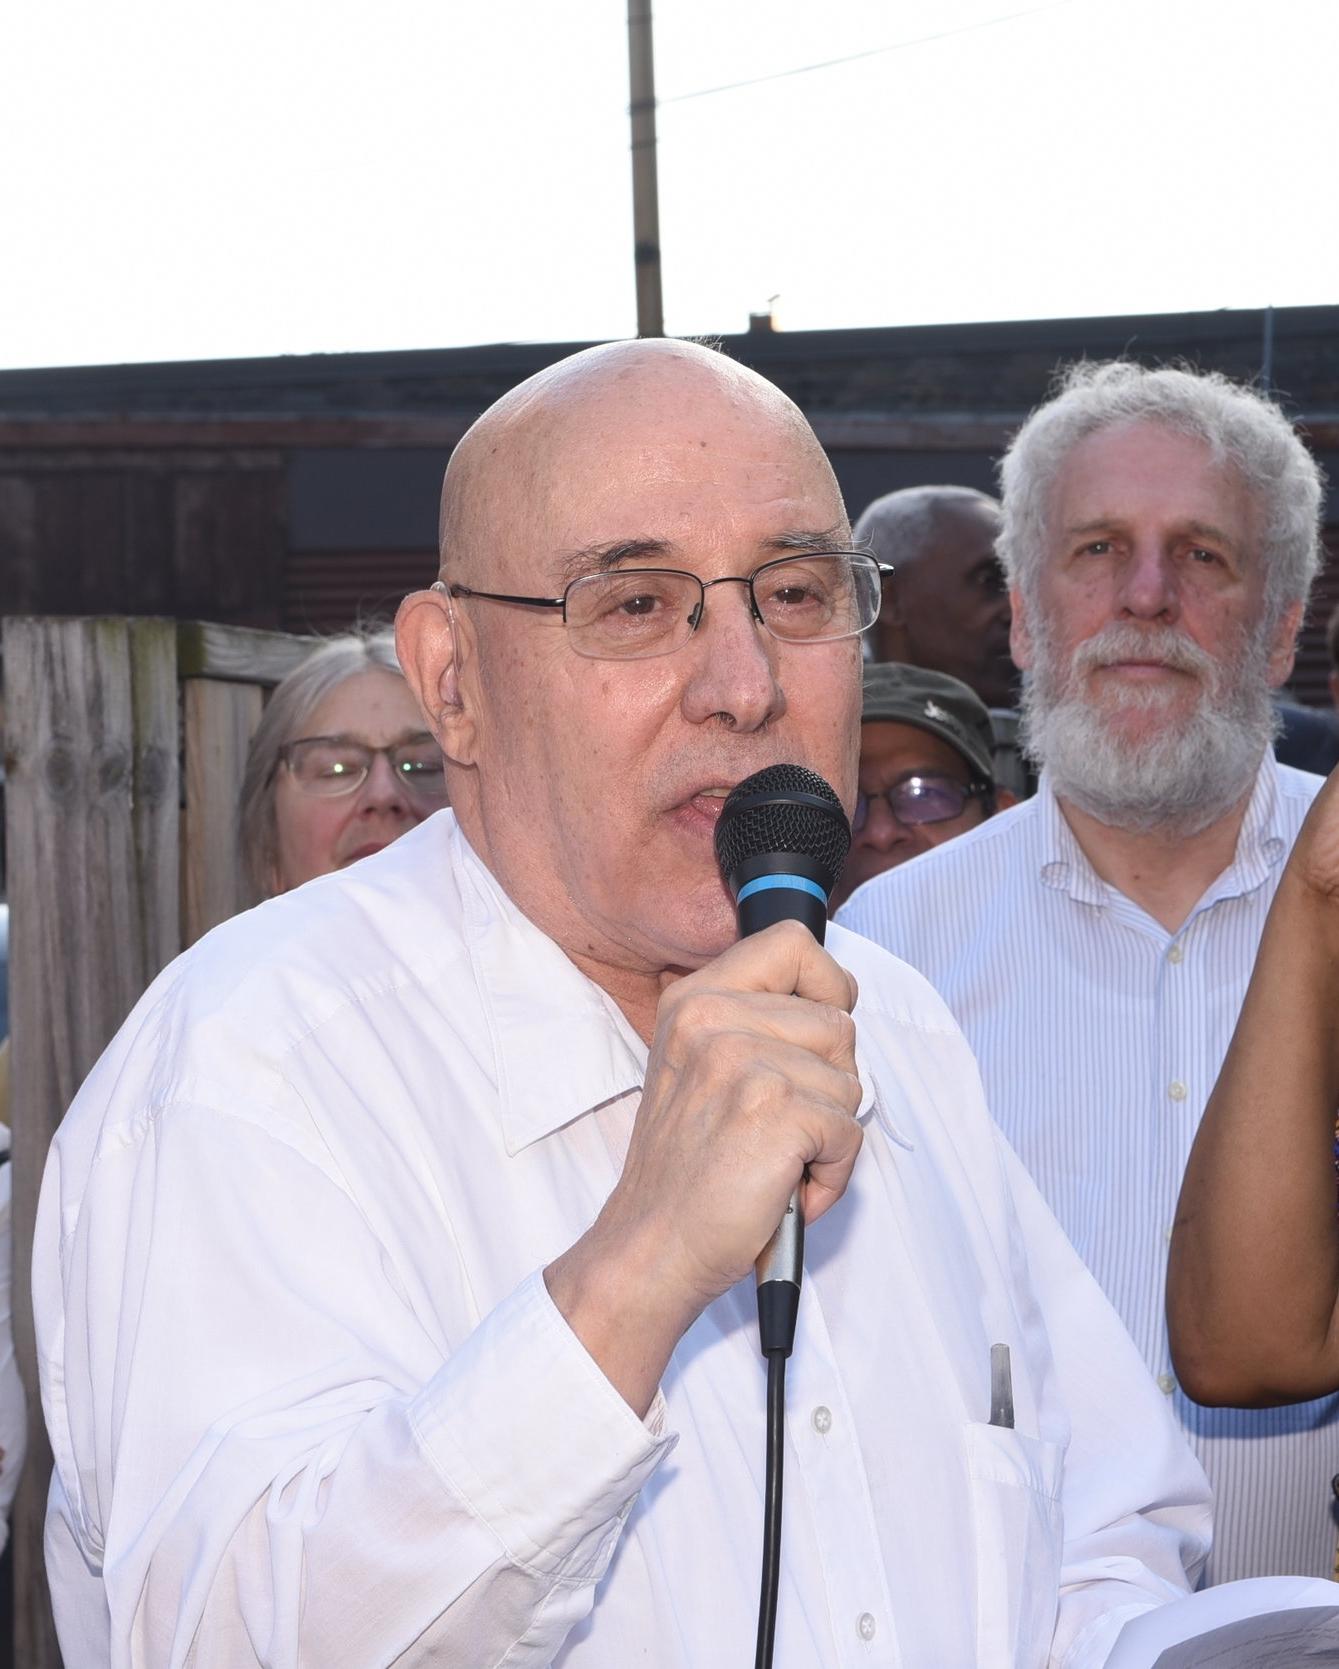 Peter Rosenthal